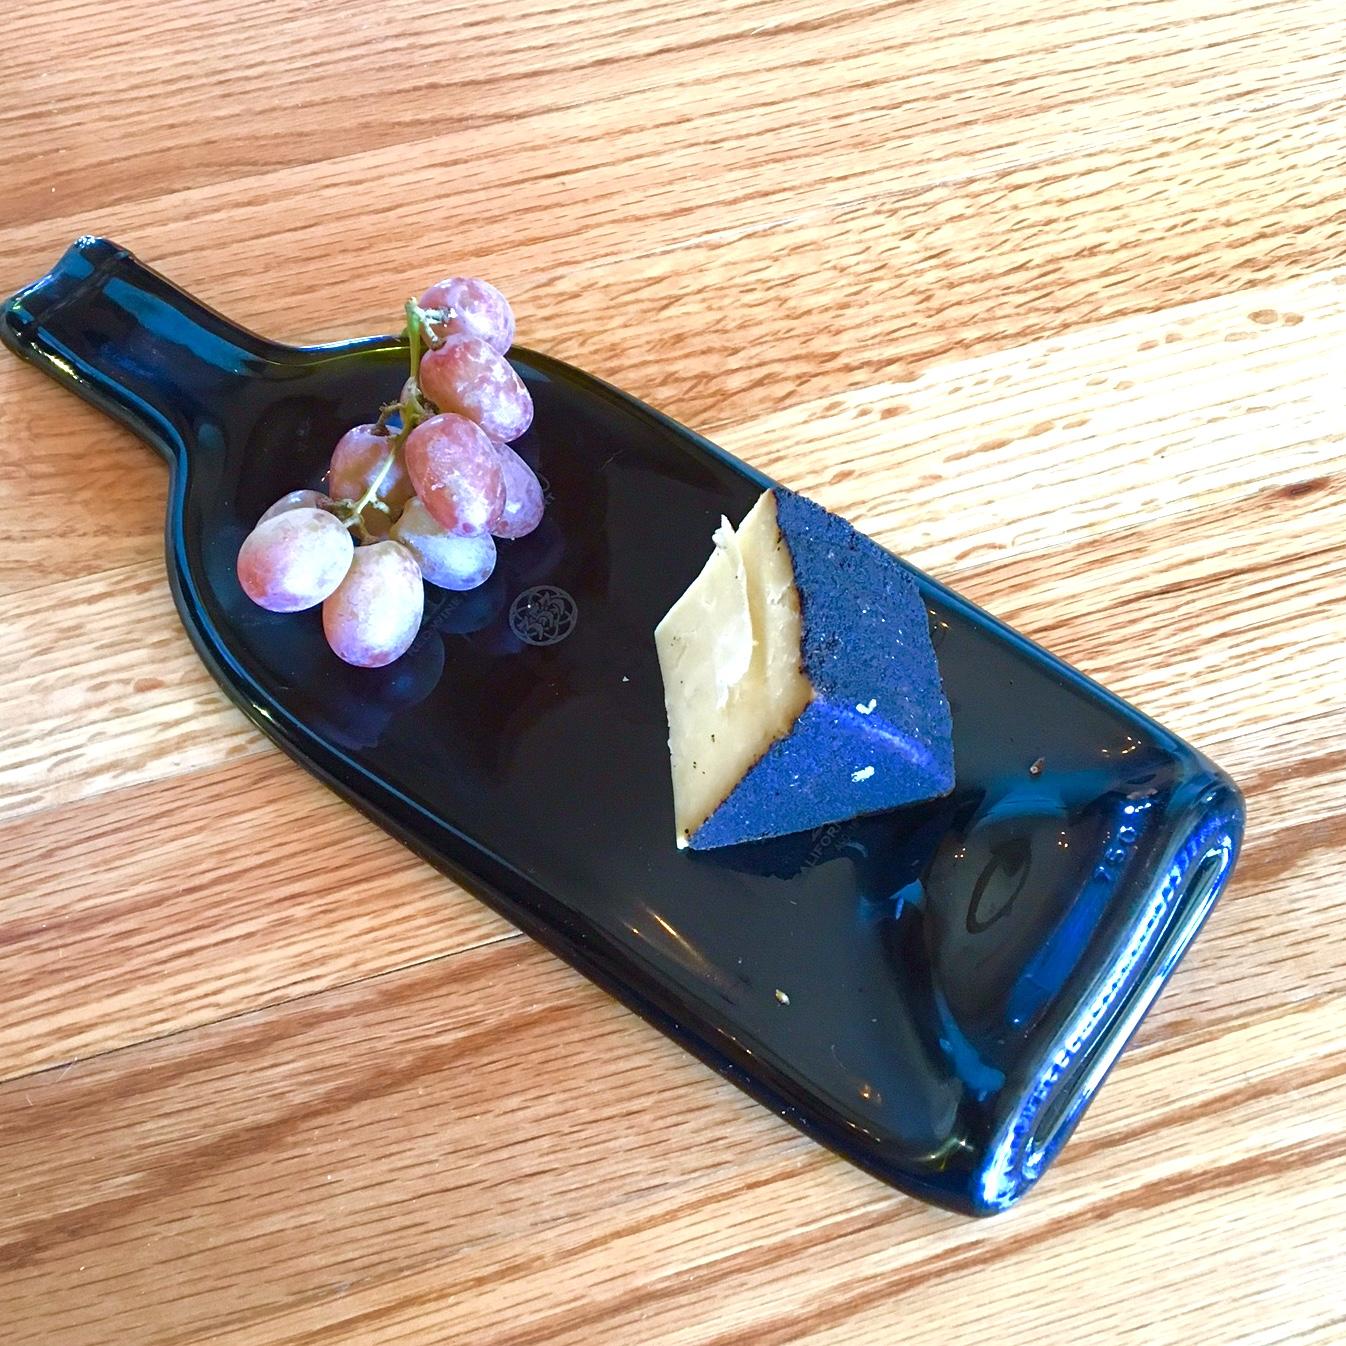 & CADUCEUS Cheese Plate